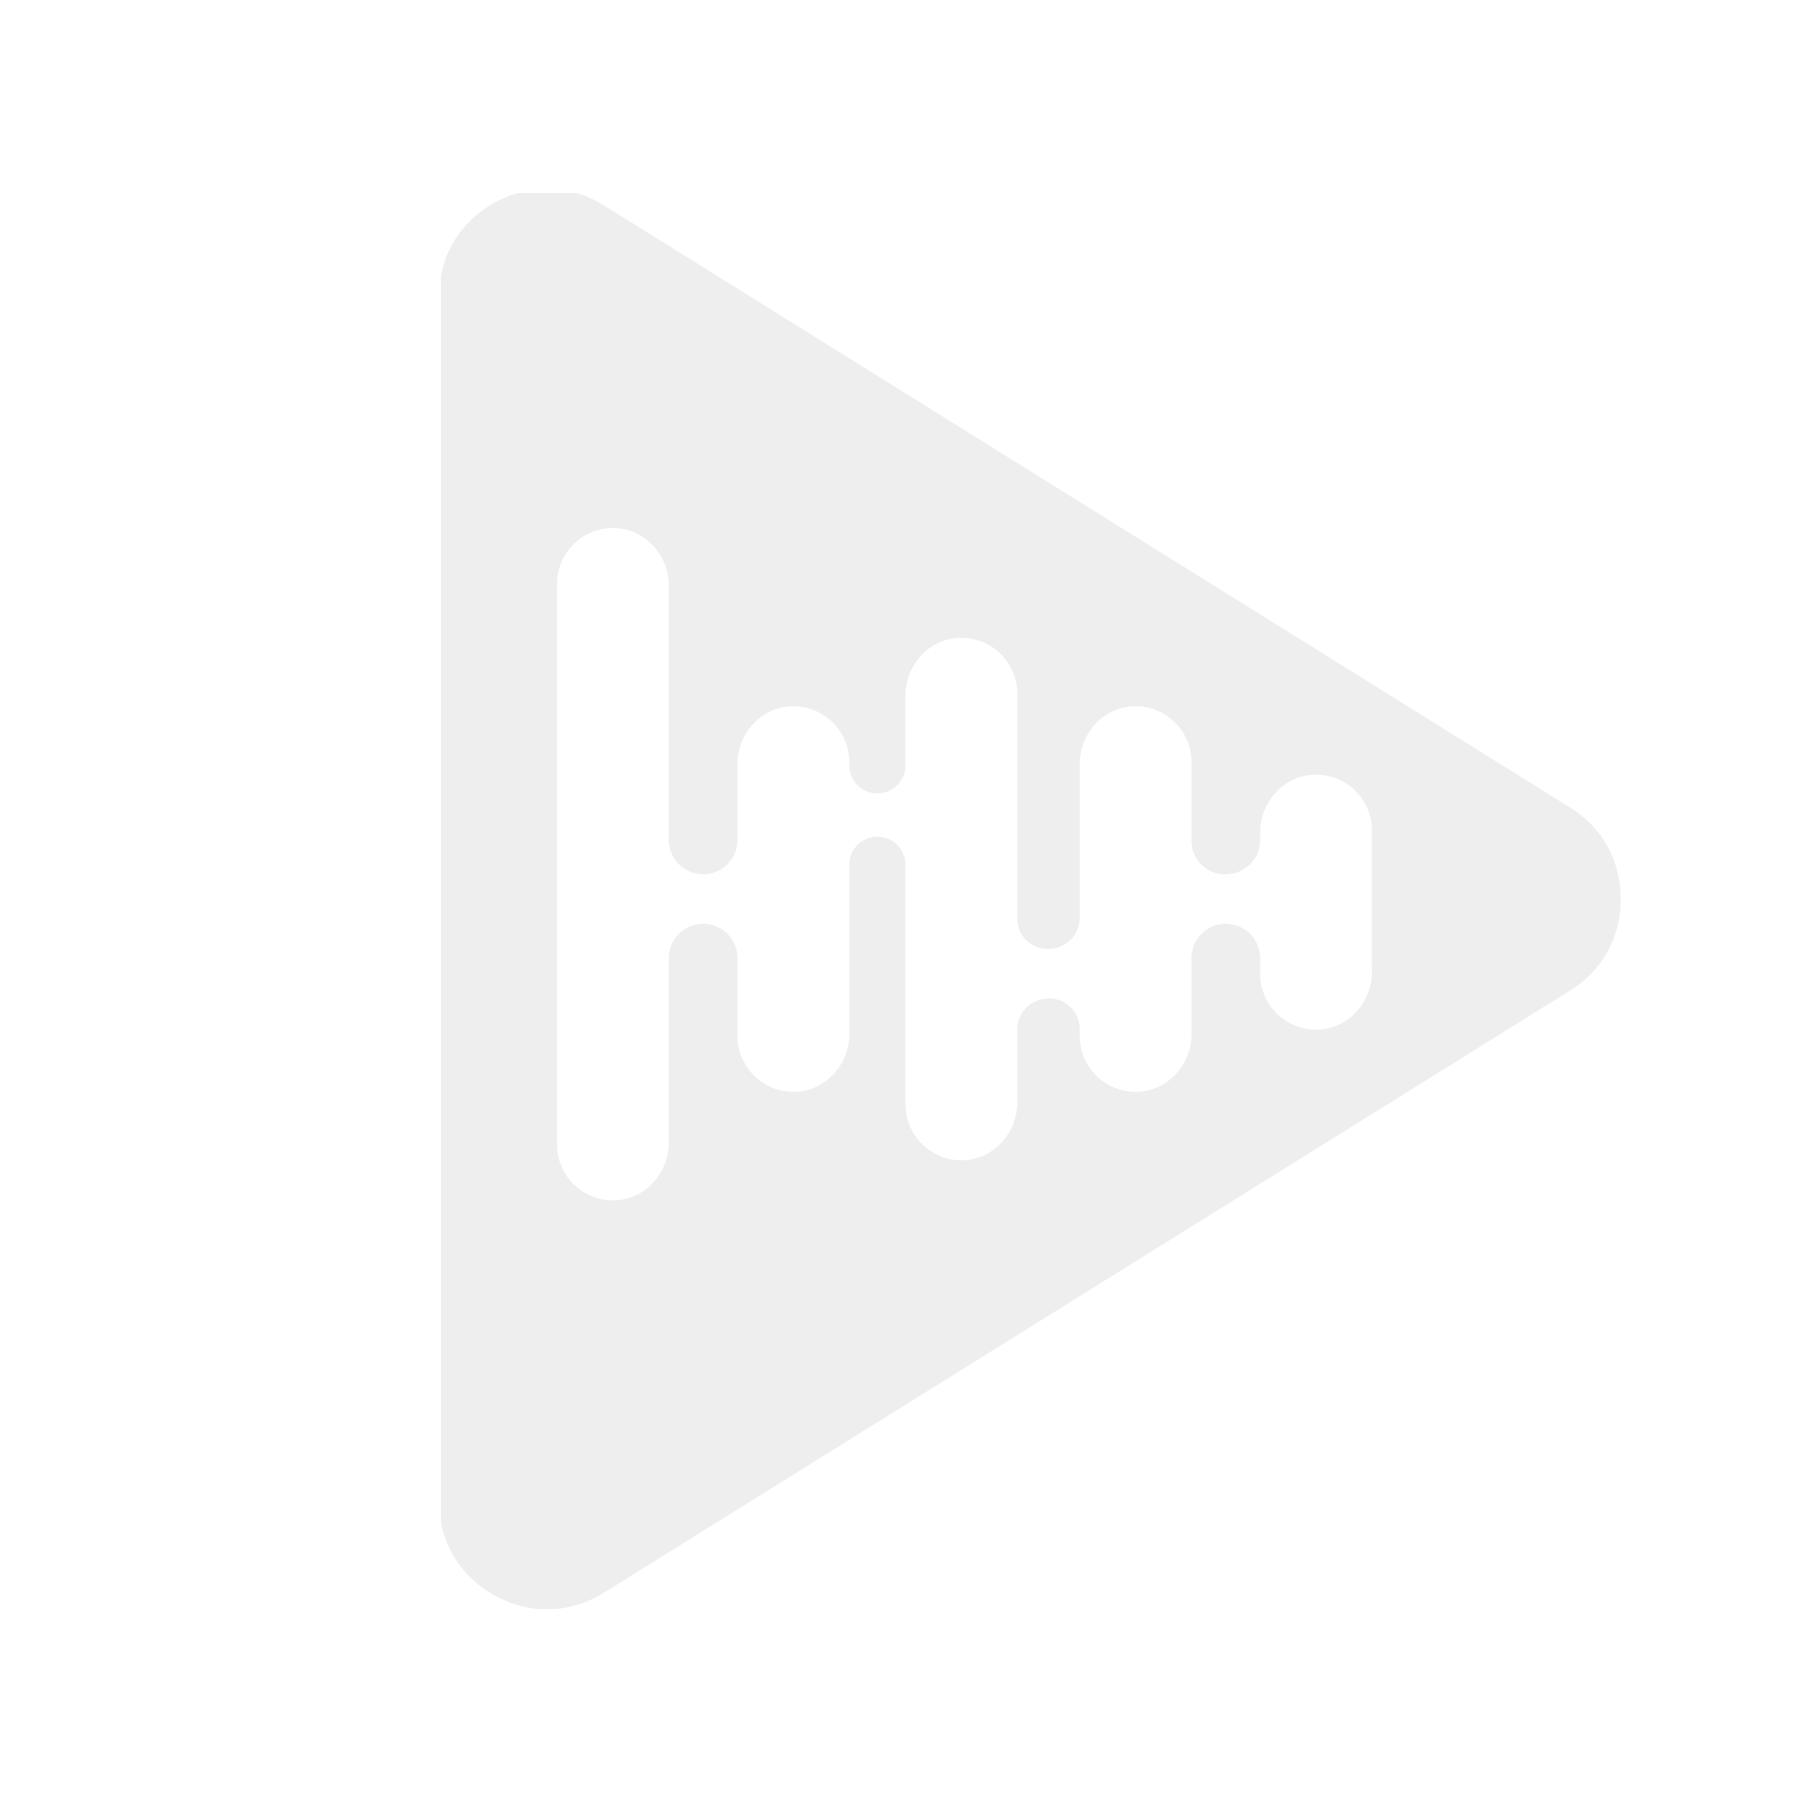 Connect BOX0005 - 5,25 høyttalergriller, Renault Twingo, bak